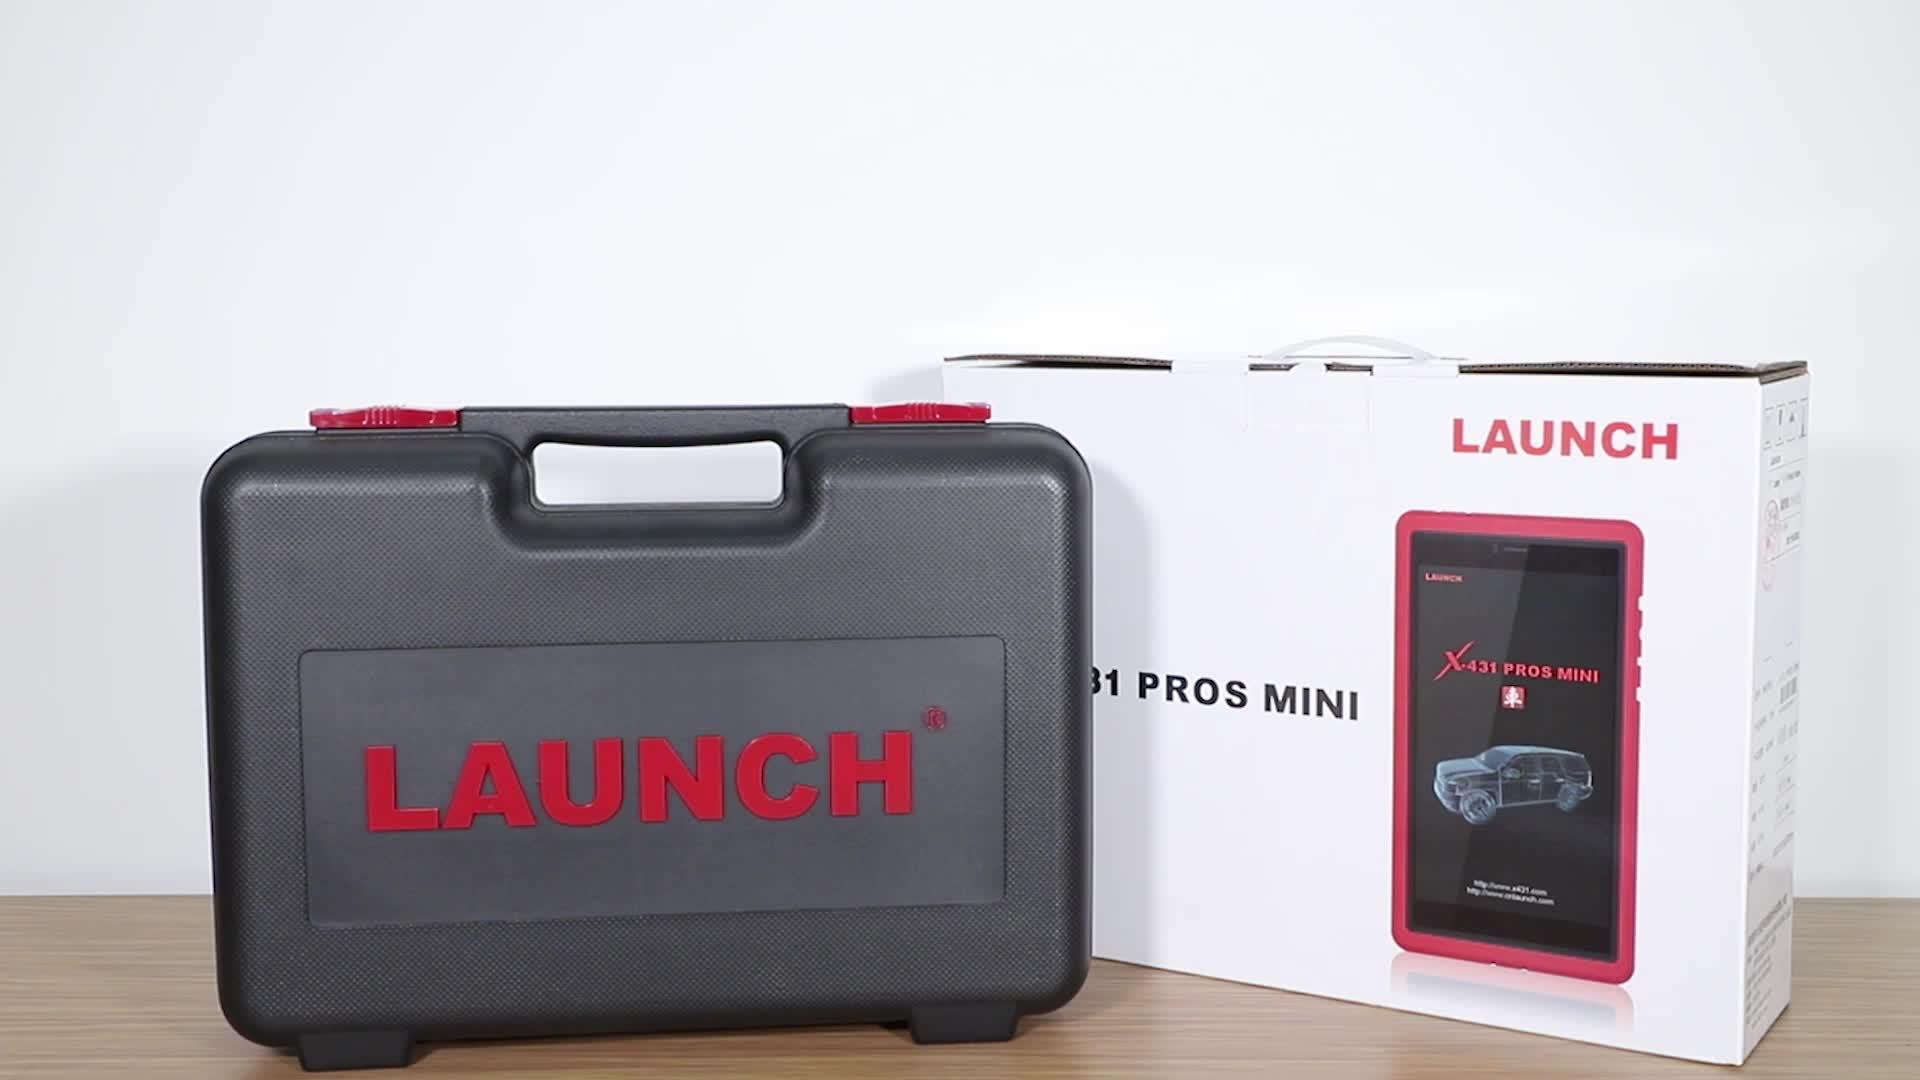 Portable Launch X431 Pros Mini / Pro Mini Scanner Vehicle Diagnostic Machine for European Japanese Car